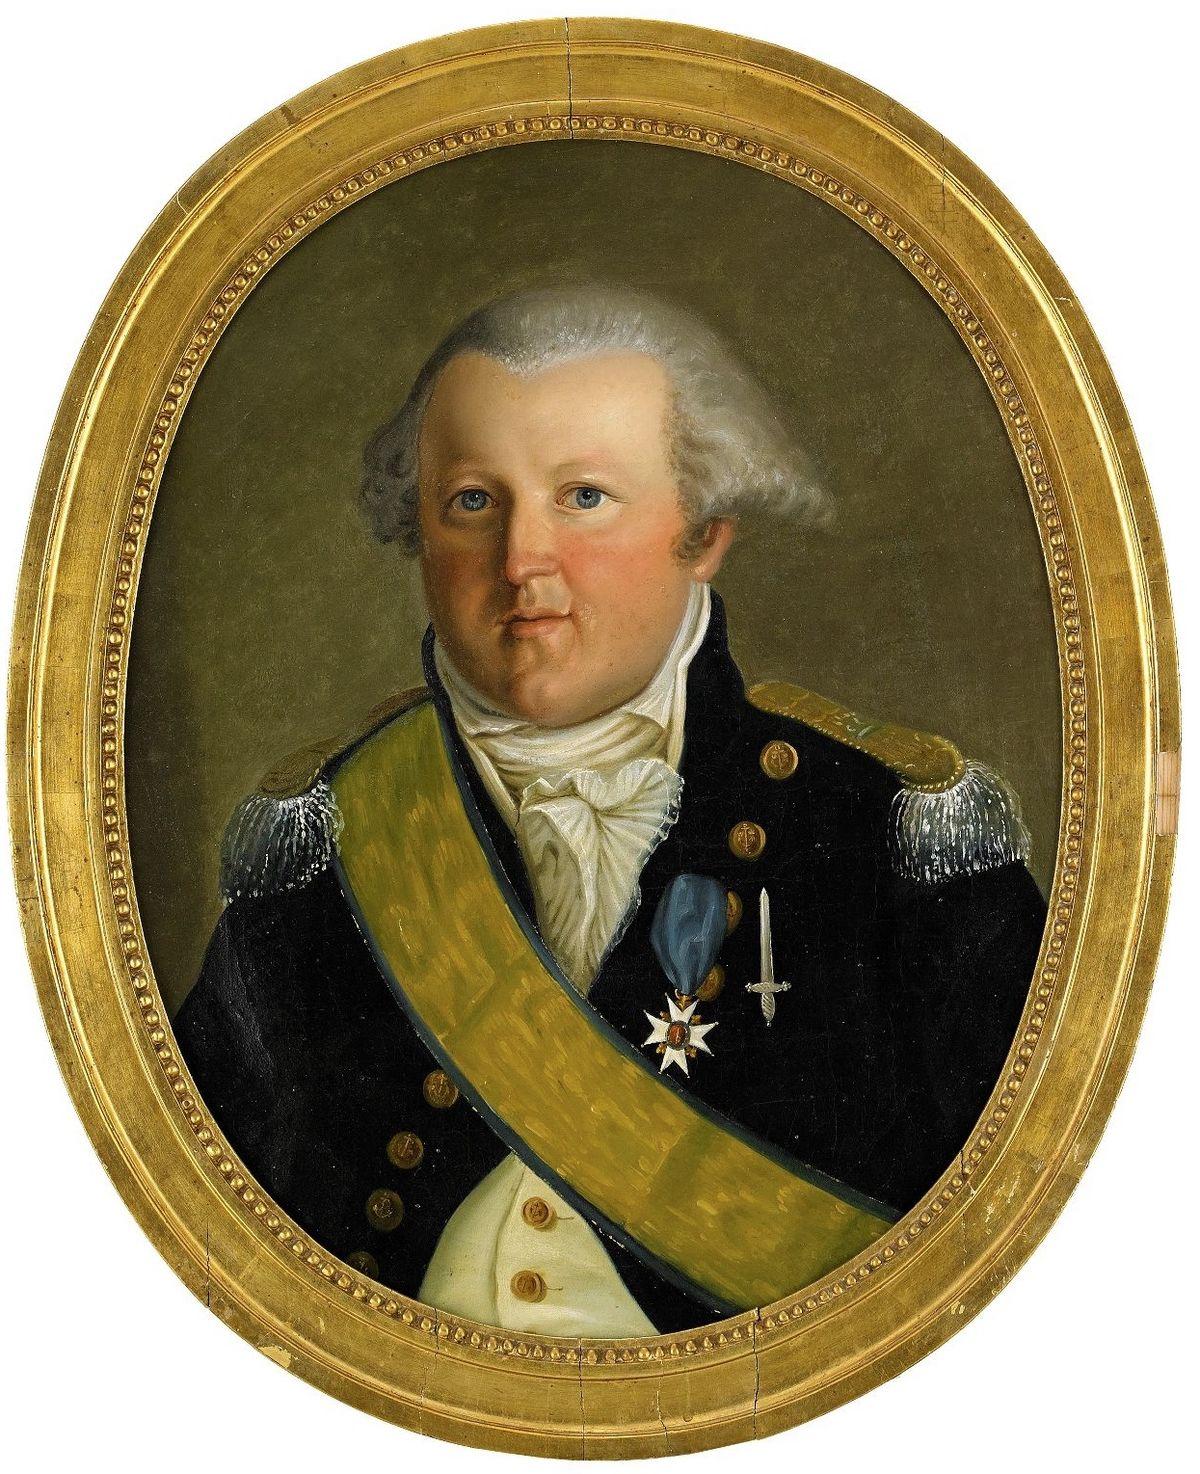 21 april 1815